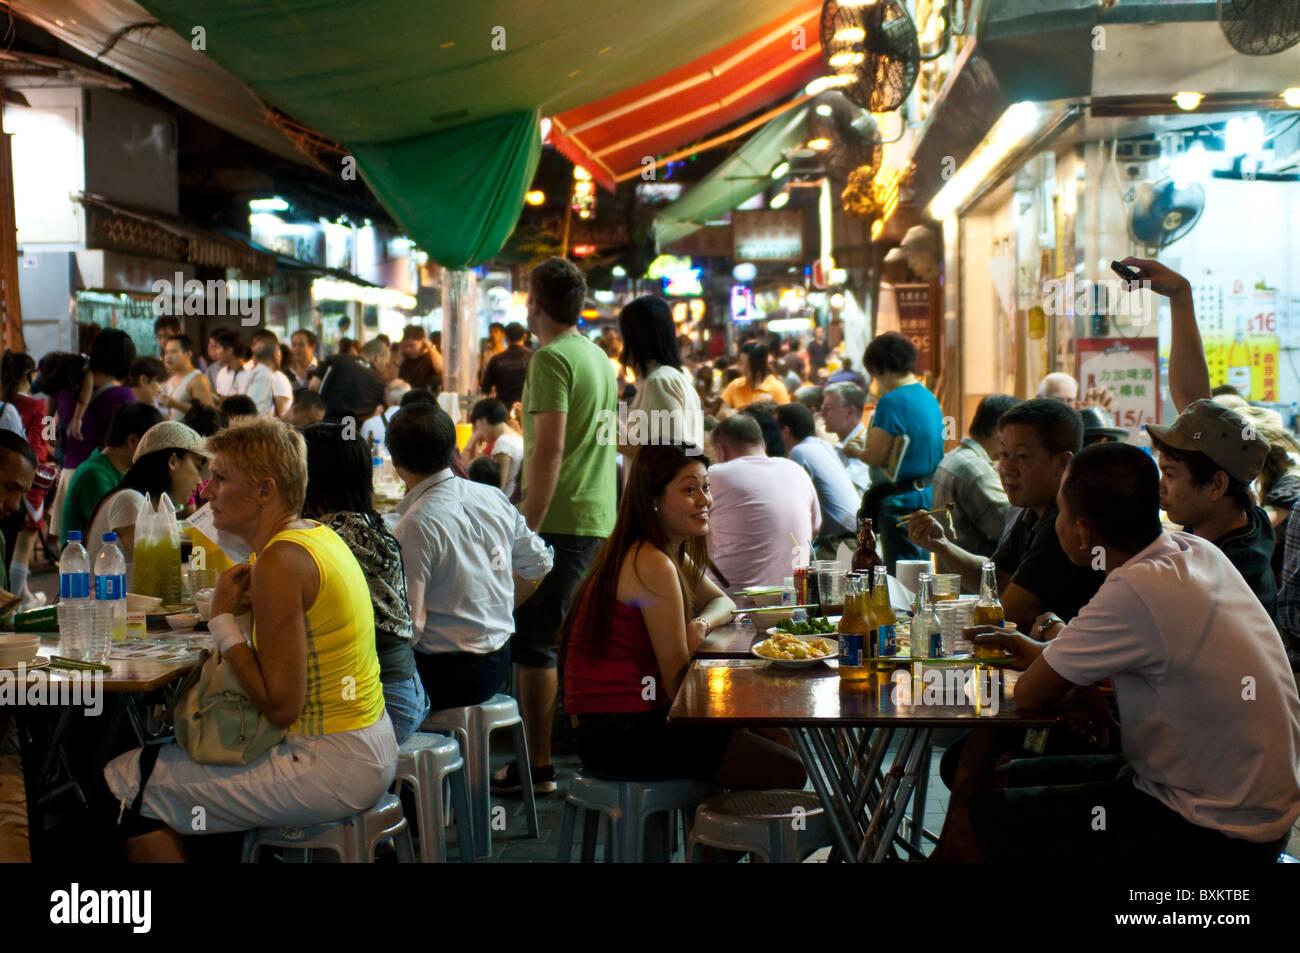 Street restaurants, Yau Ma Tei, Kowloon, Hong Kong, China Stock Photo